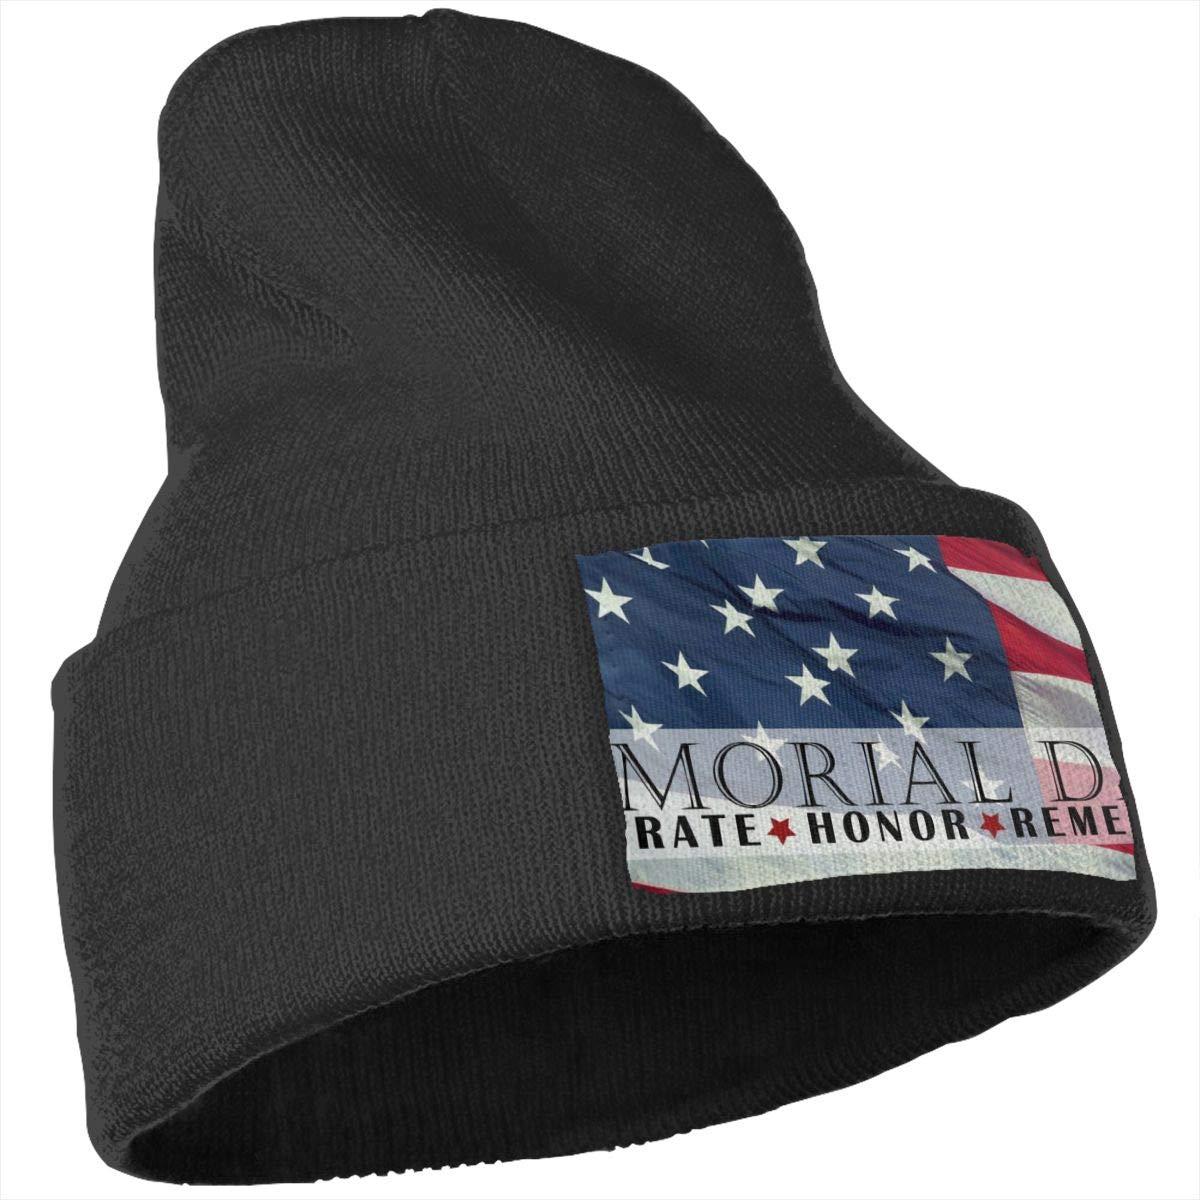 Veterans Day American Flag Memorial Day Skull Cap Men Women Knit Hats Stretchy /& Soft Beanie